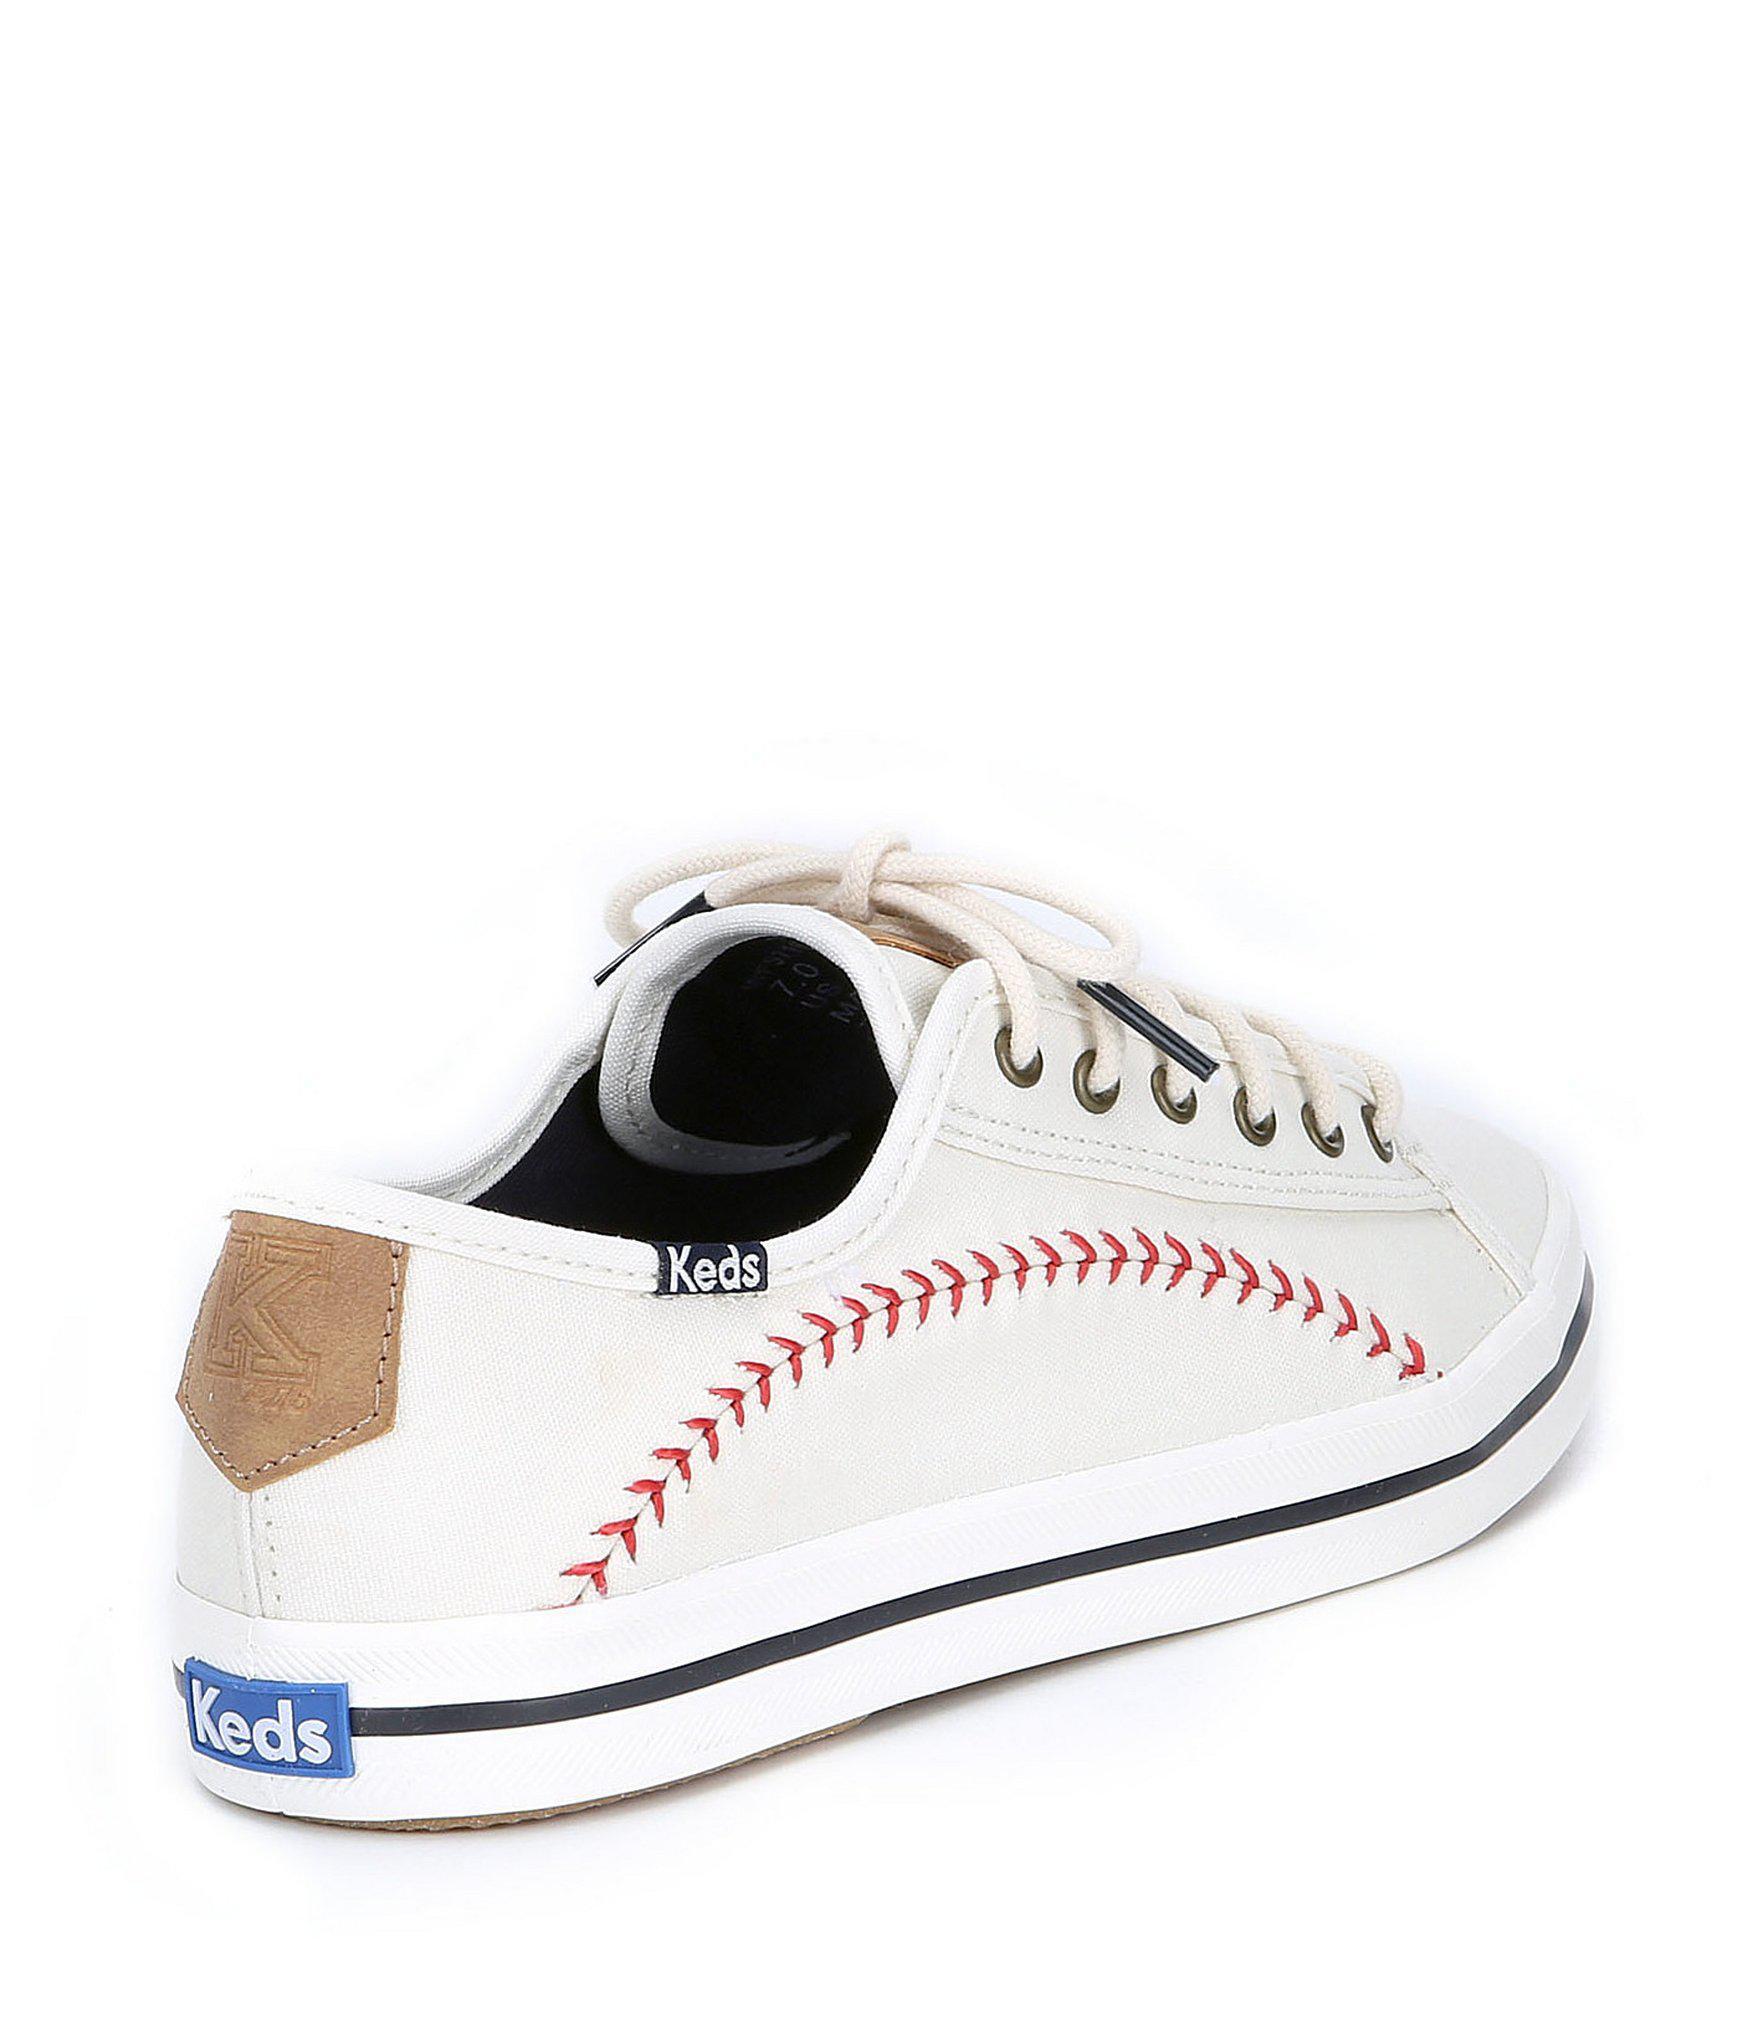 5f6c0161e8cb7 Lyst - Keds Kickstart Pennant Baseball Stitch Sneakers in White